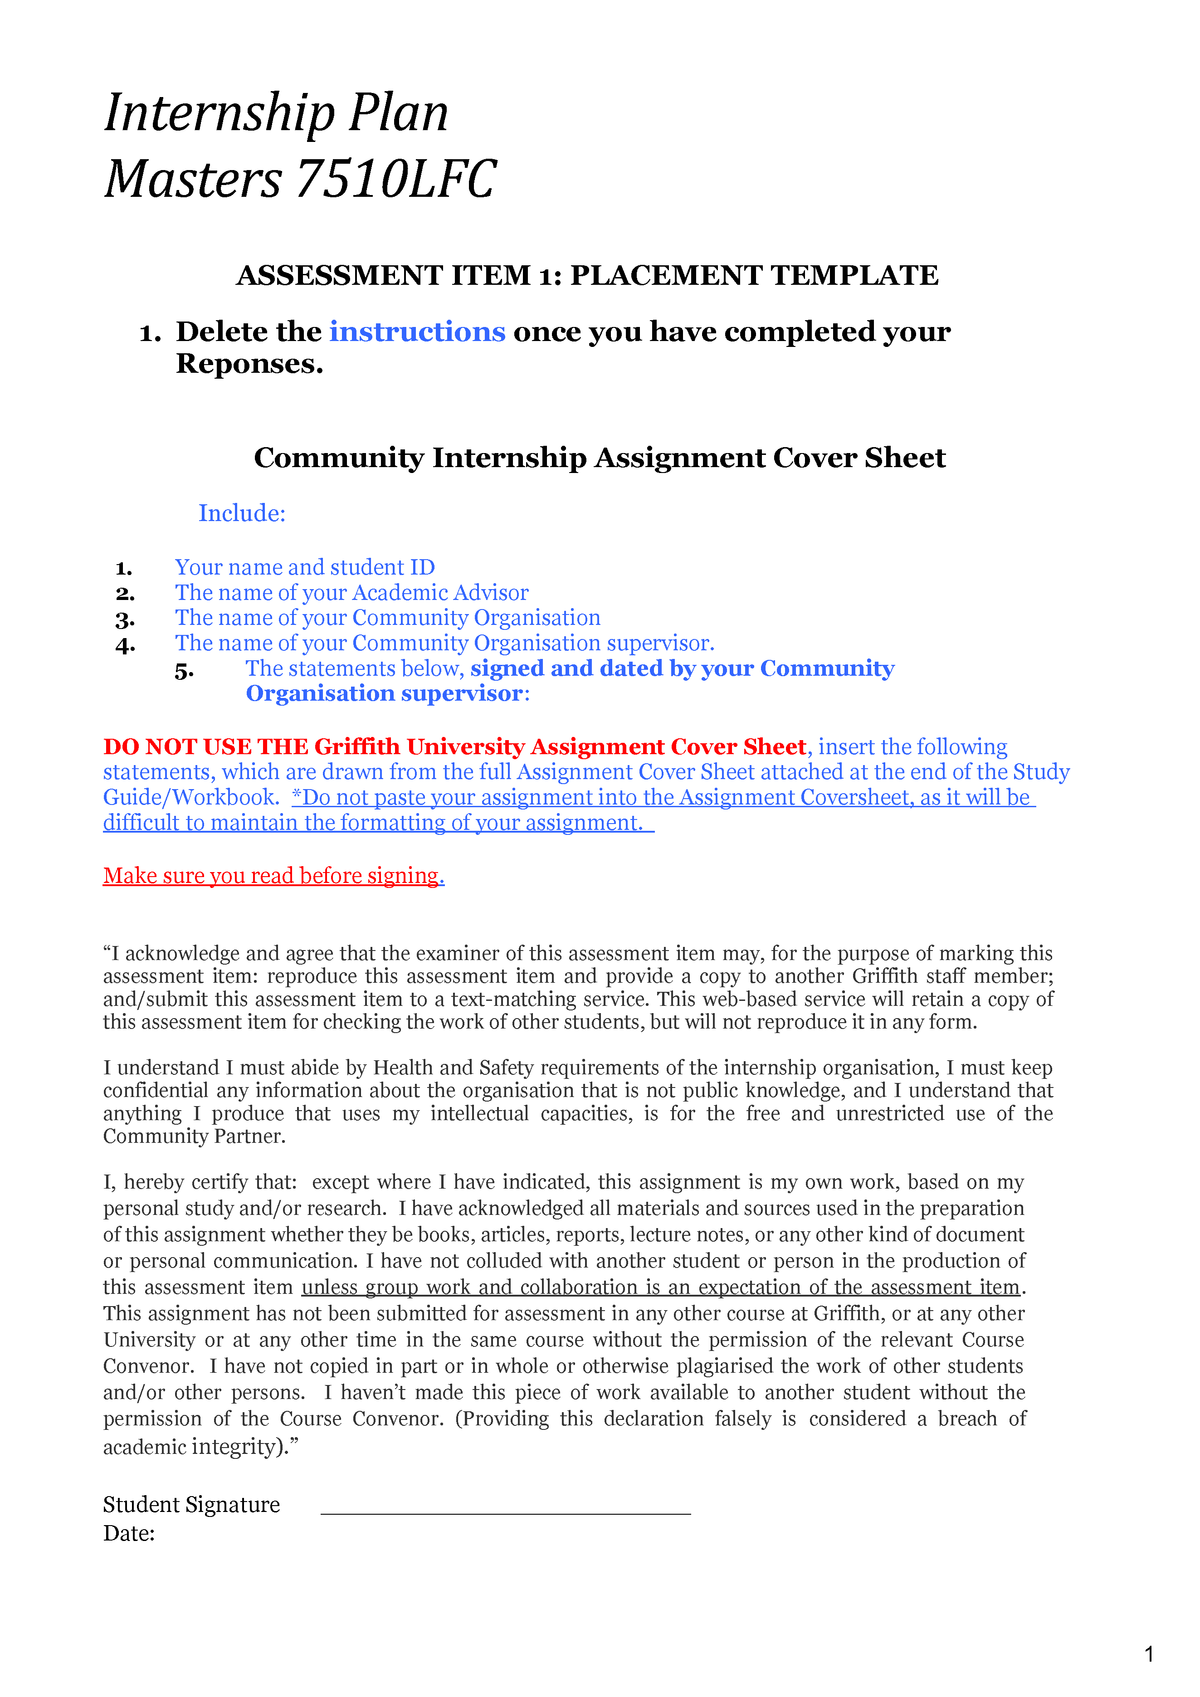 7510LFC Masters Internship Plan template - 3002GIH - StuDocu